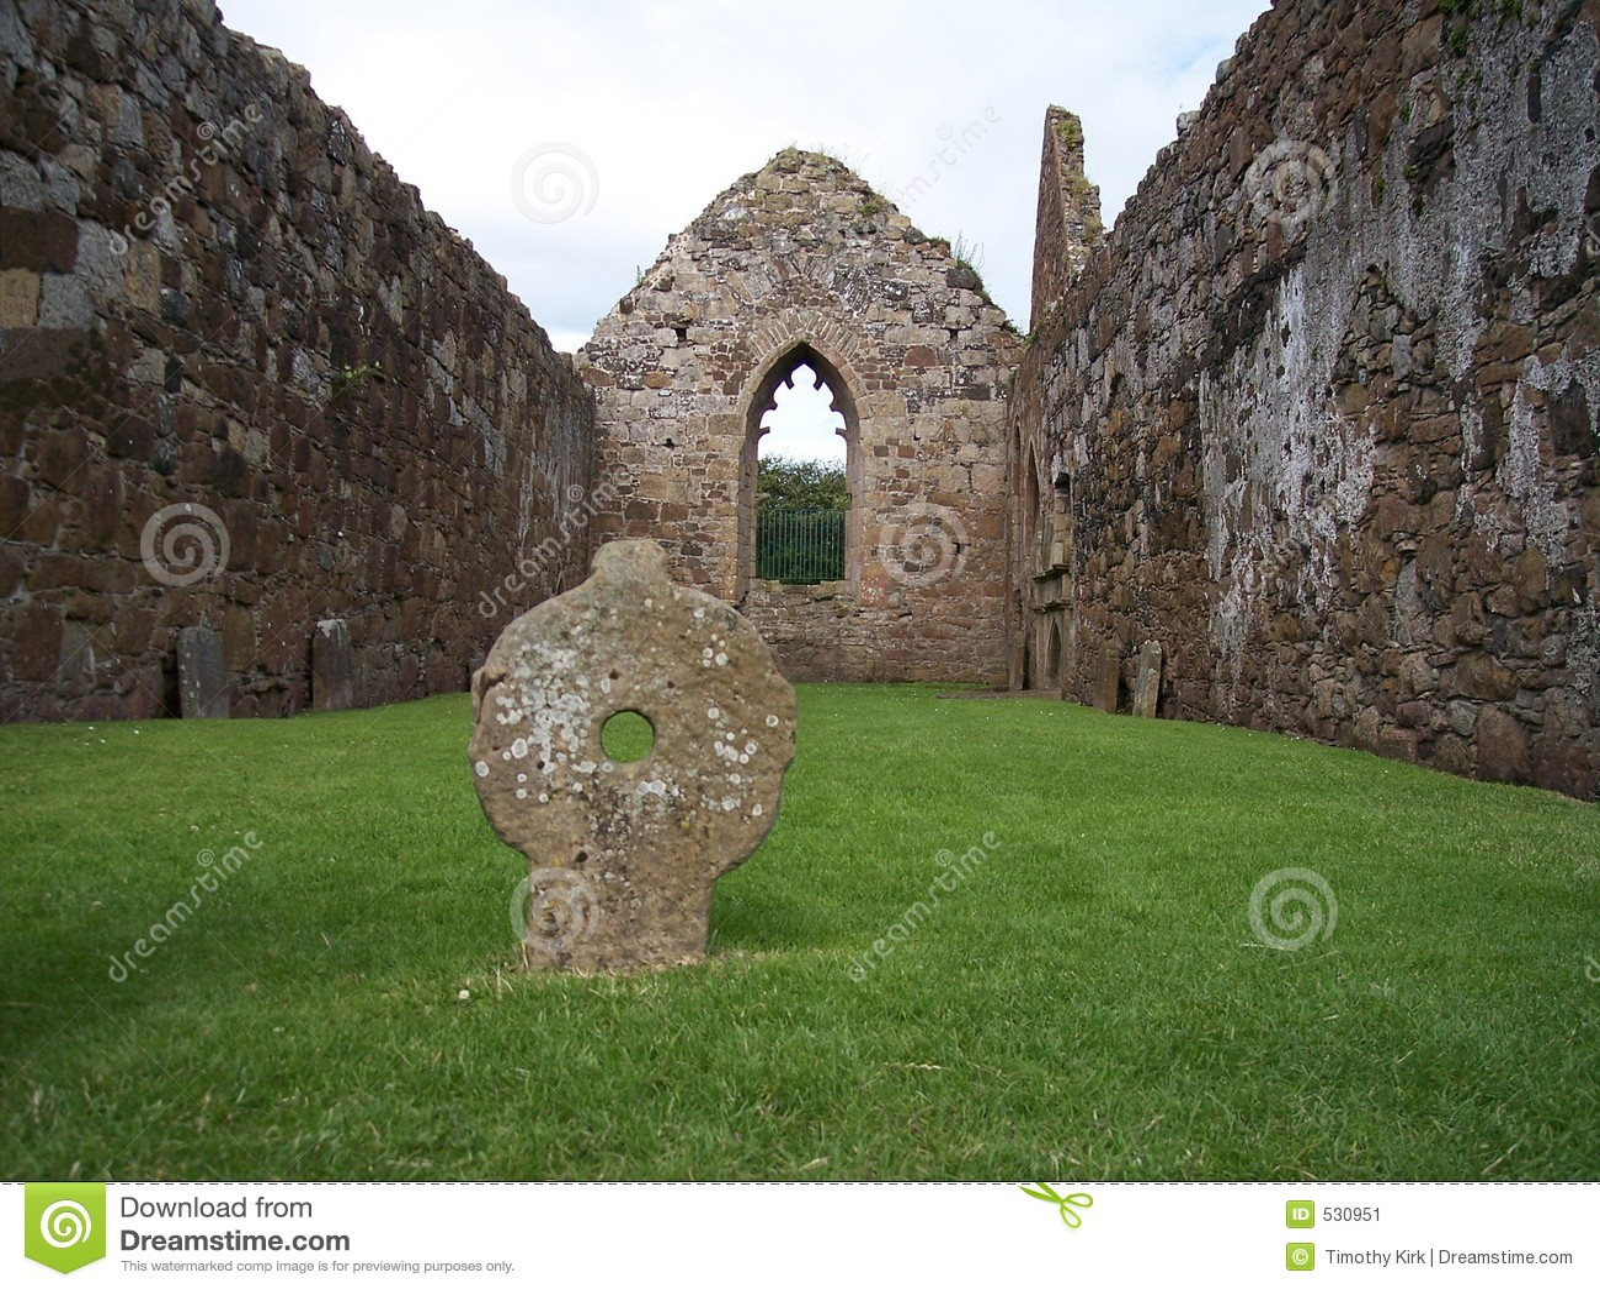 Download 安特里姆bunamargy co男修道院 库存图片. 图片 包括有 山墙, 石头, 宗教信仰, 天空, 耶稣受难象 - 530951